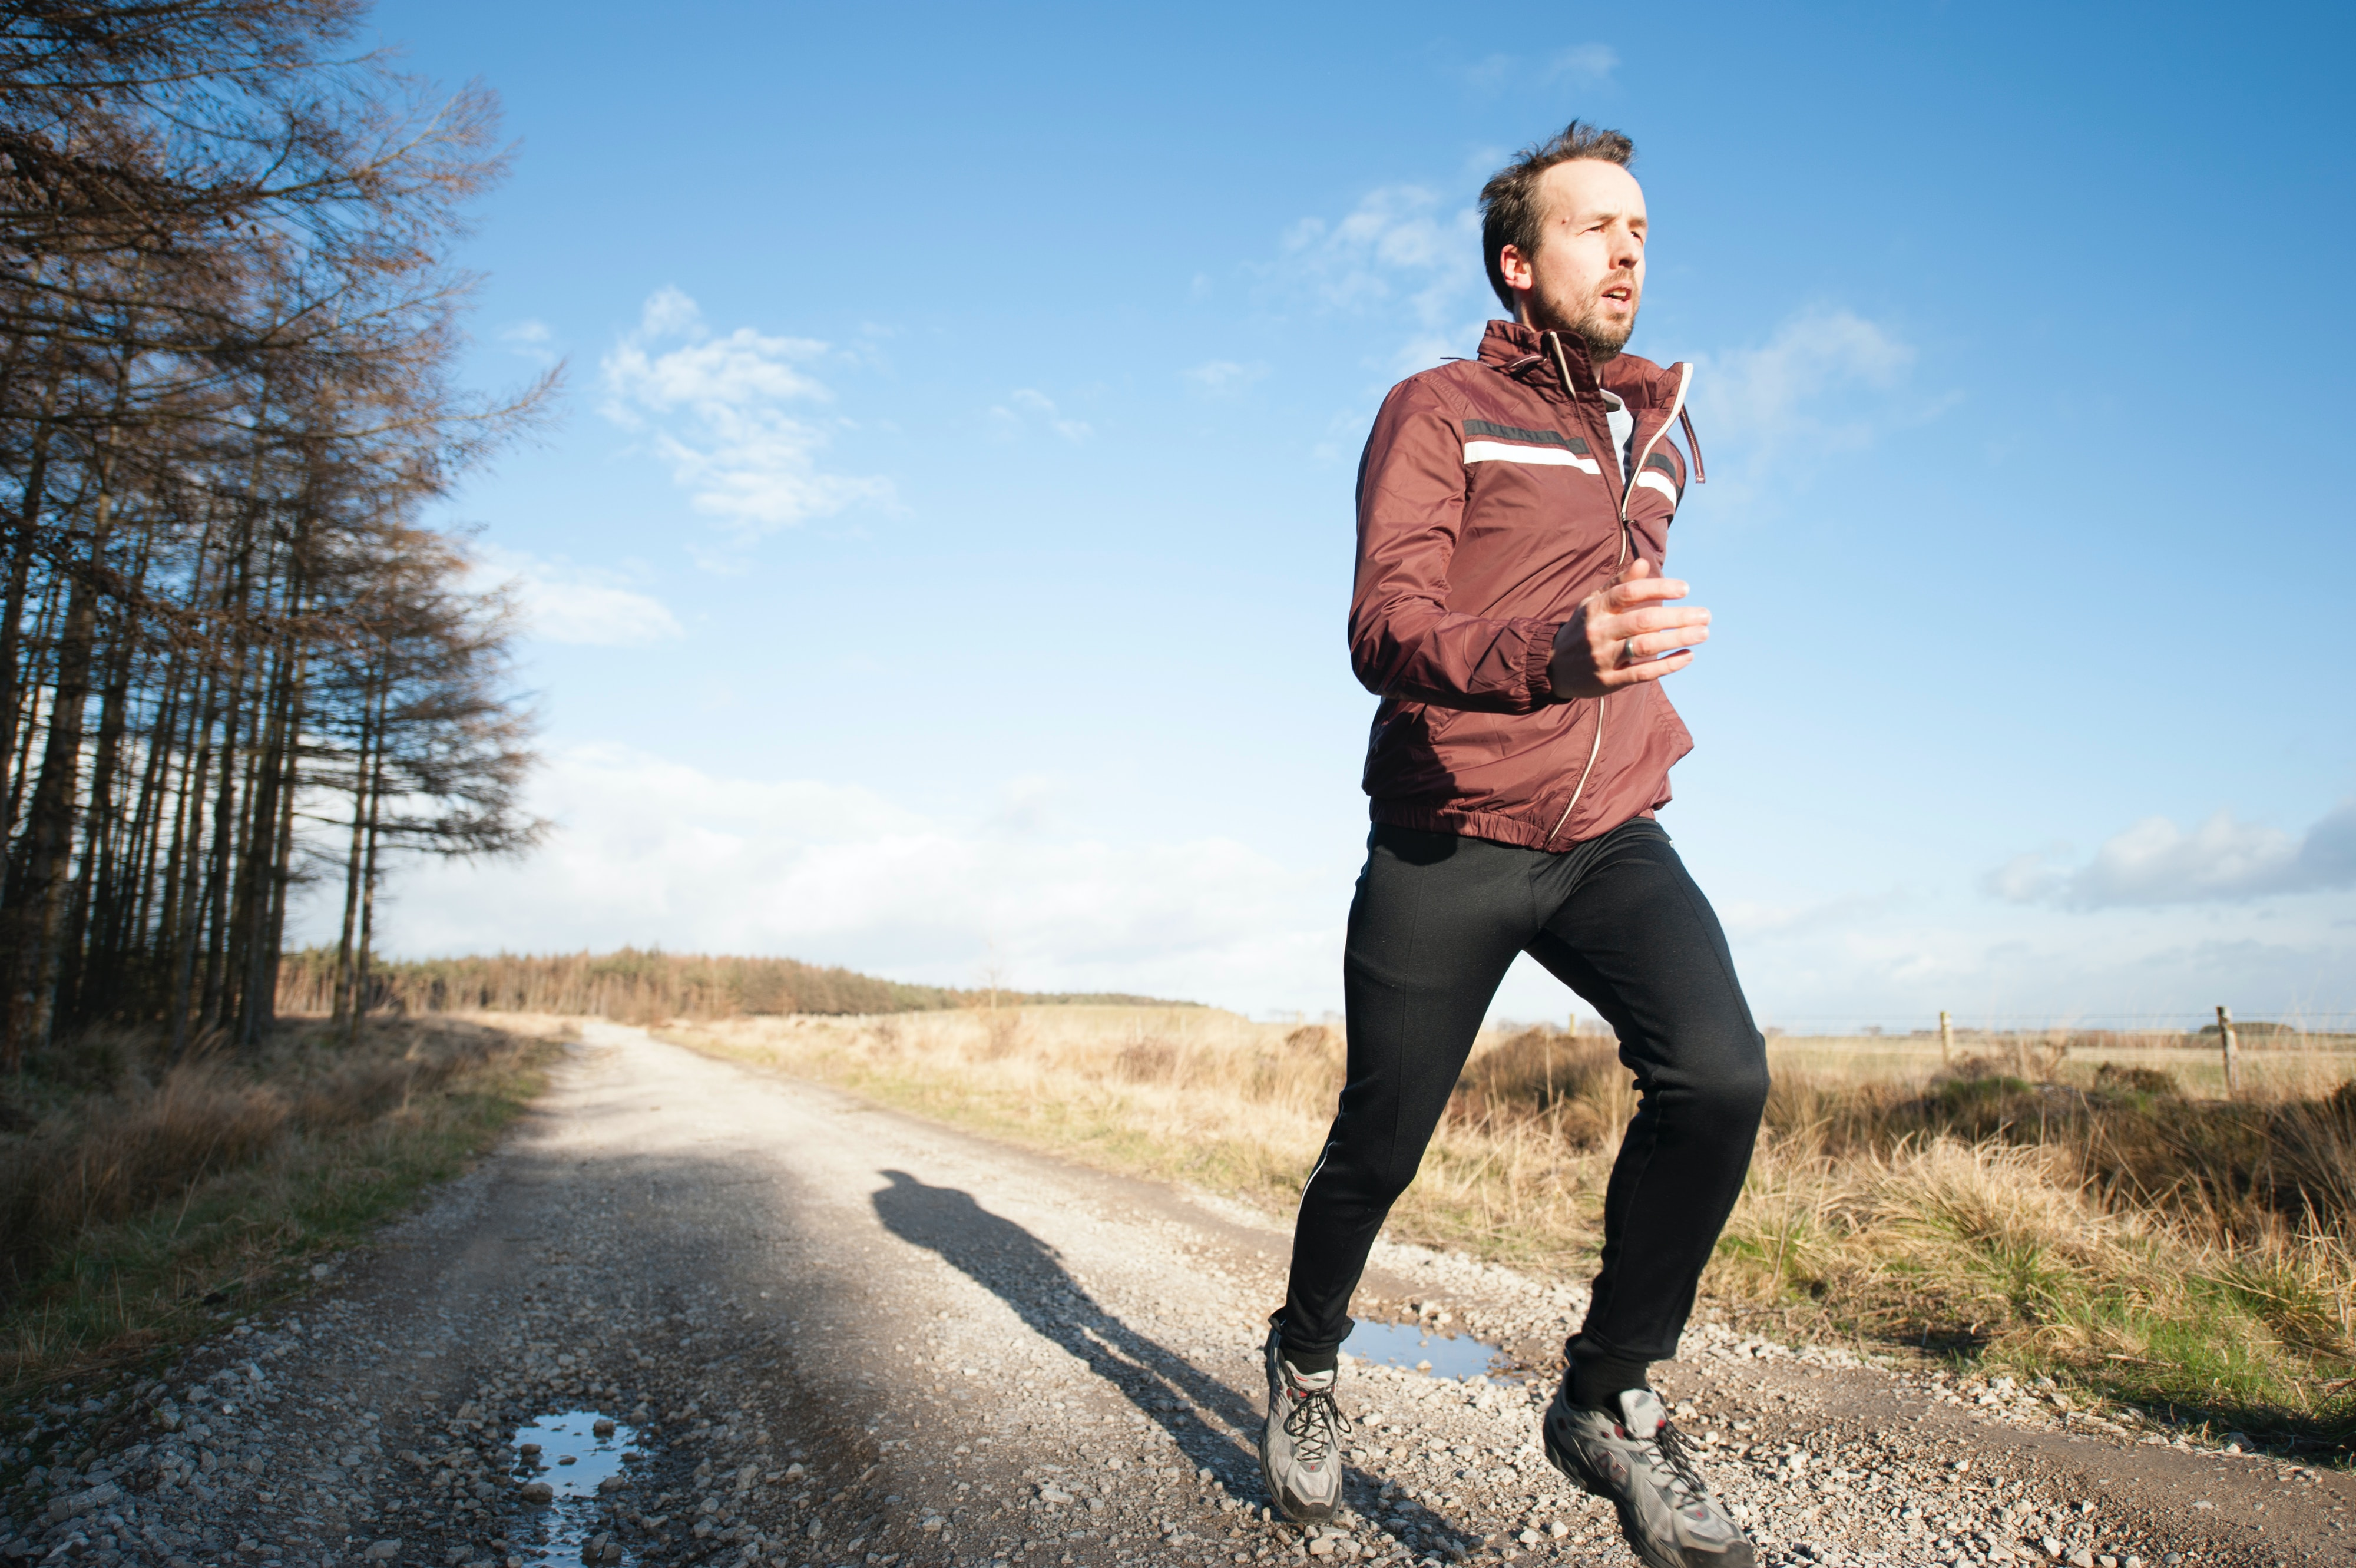 Why You (Yes, You!) Should Run a Marathon